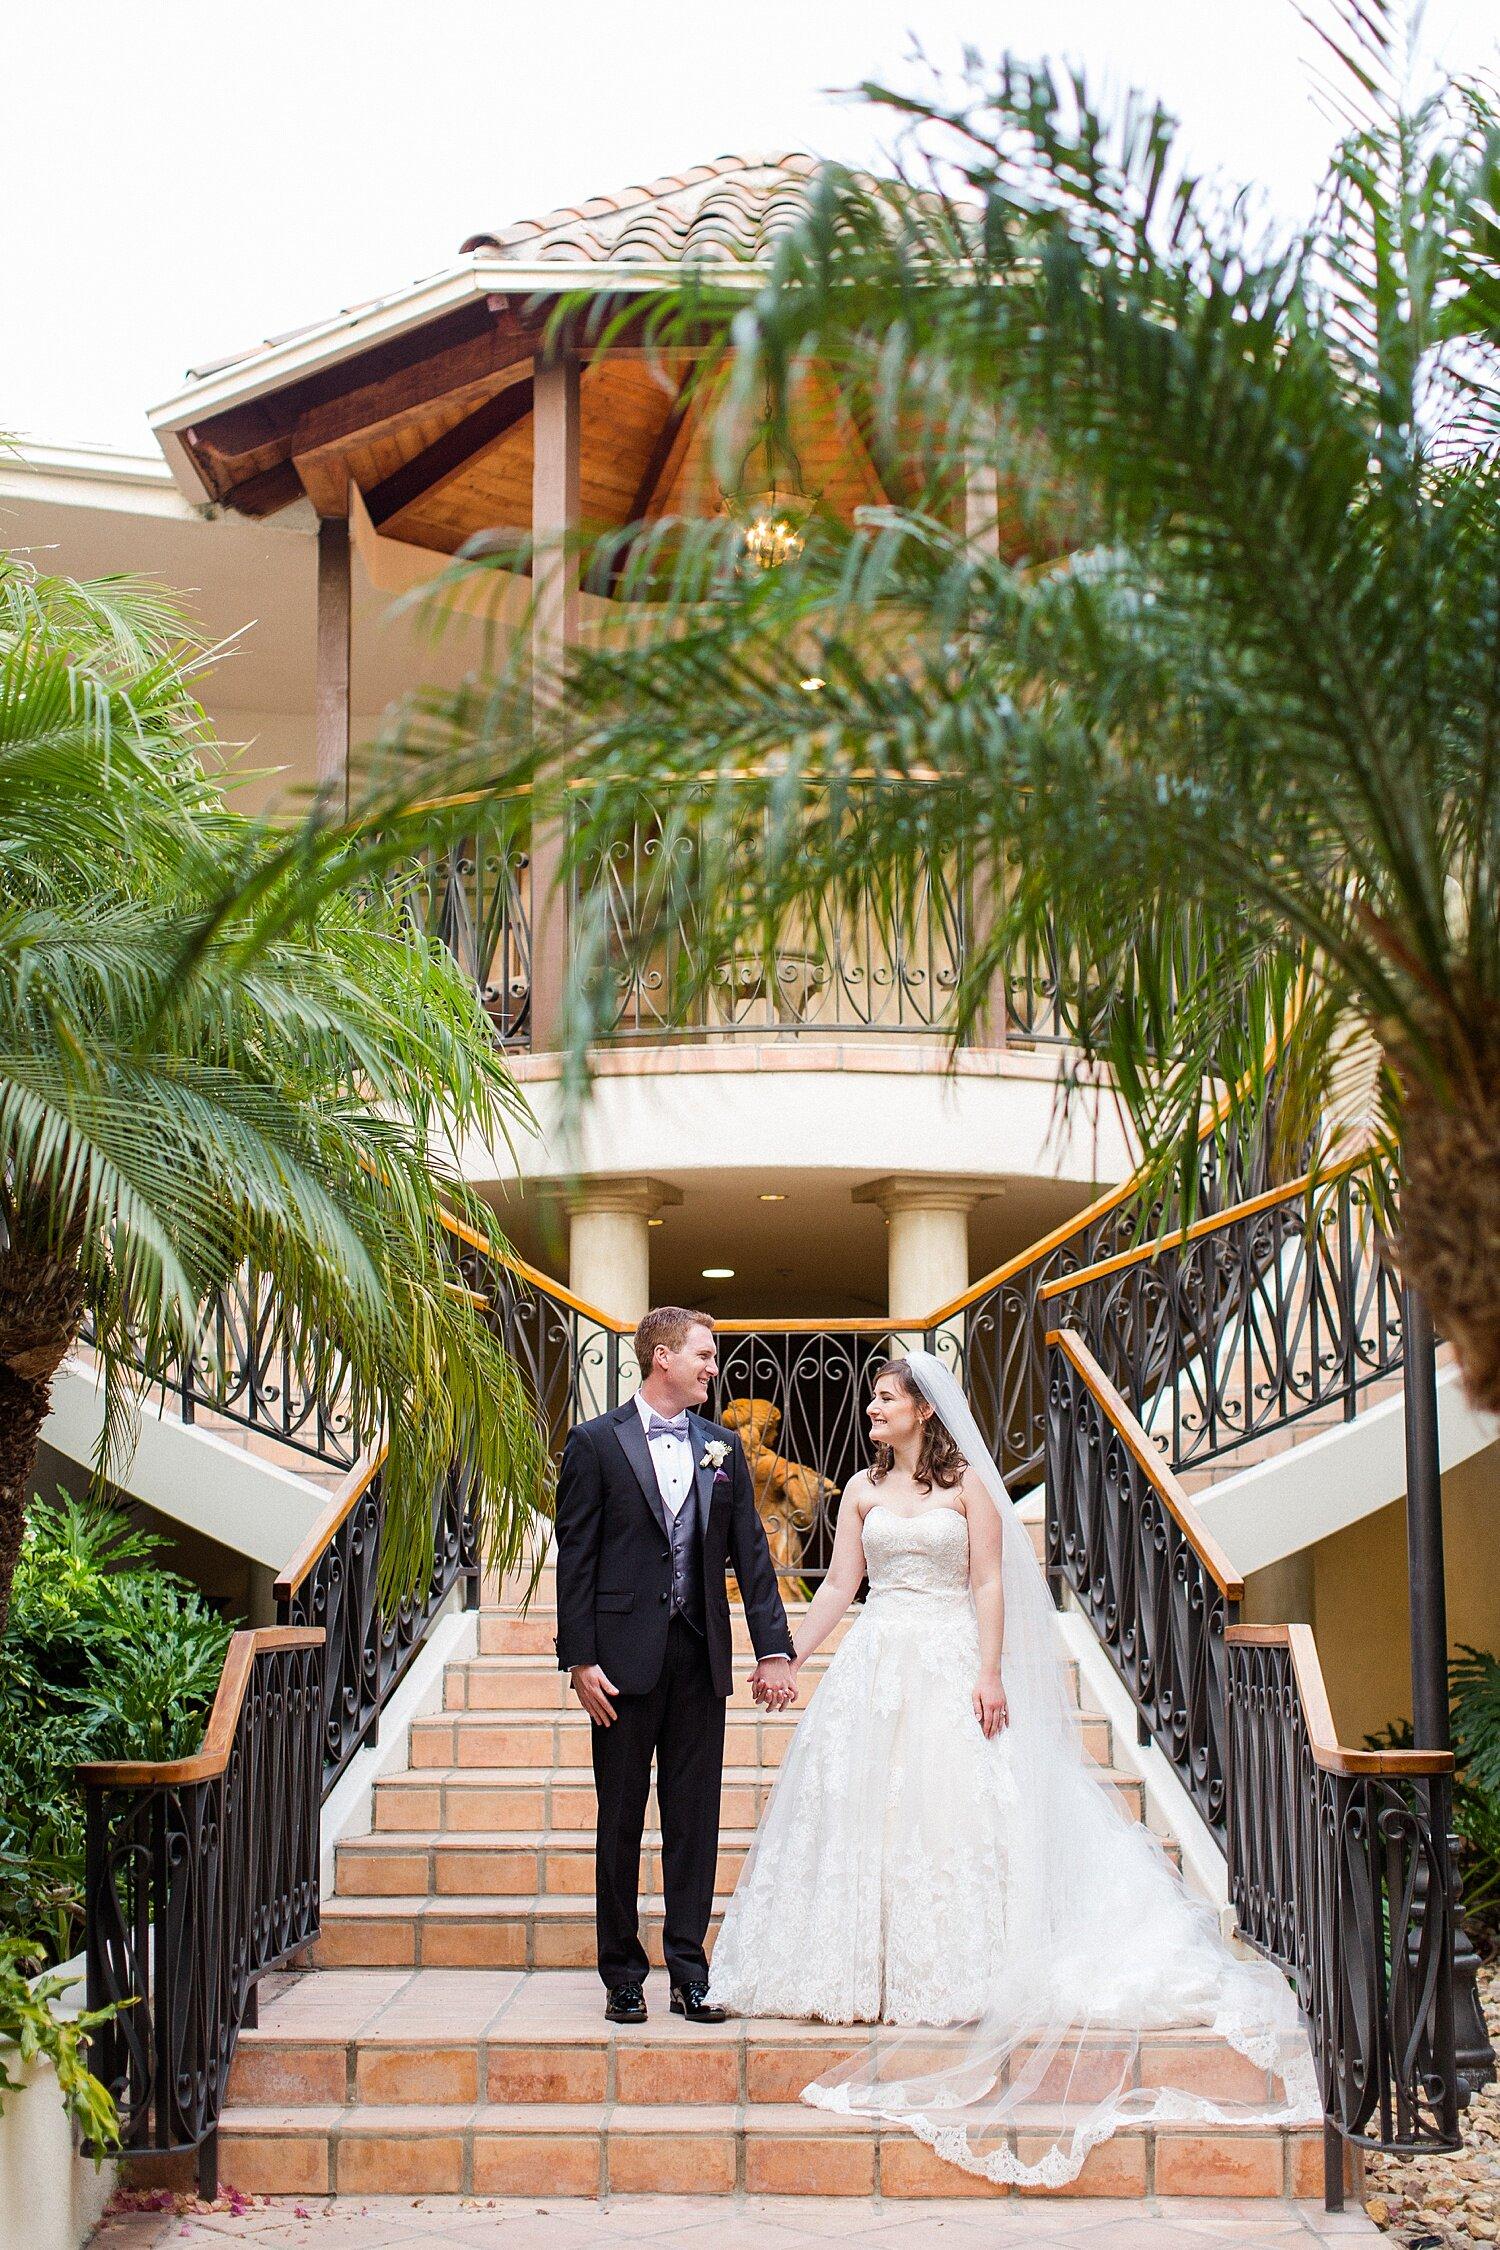 westlake-village-inn-wedding-photographer_0165.jpg